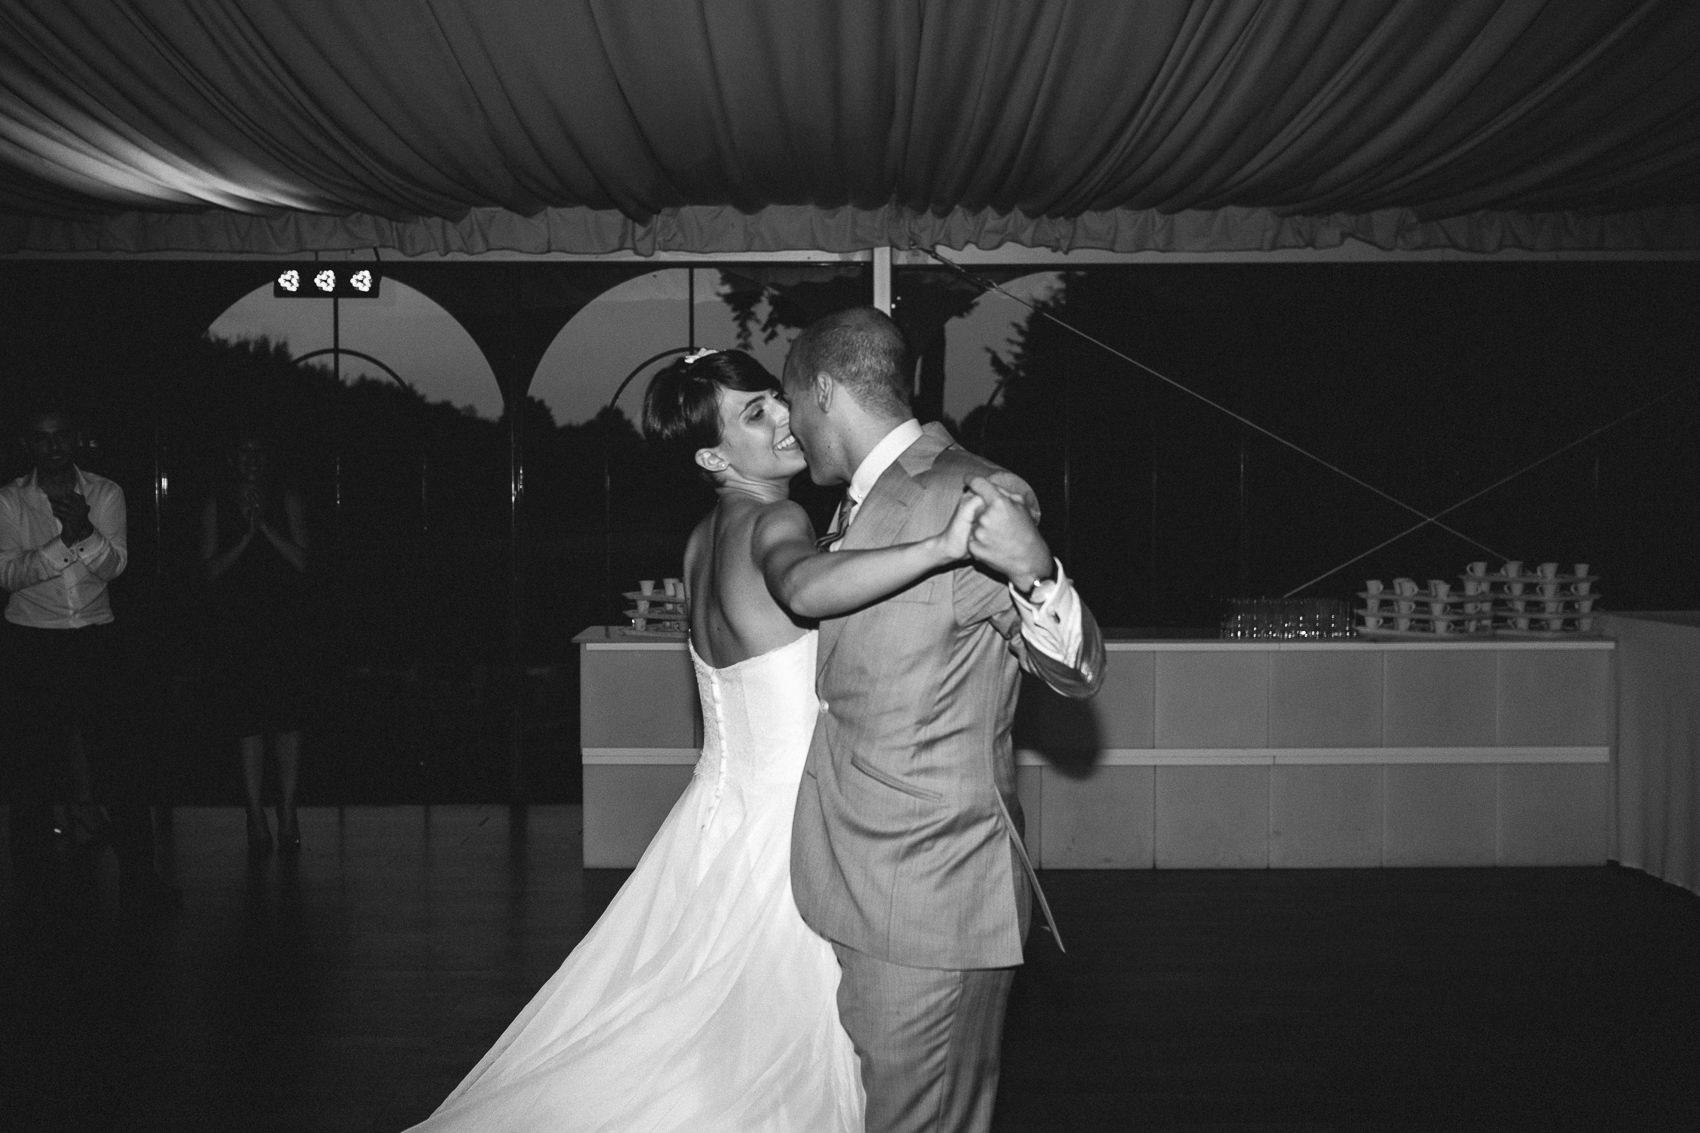 mariage-charlotte-et-joel-trendzphotography-118